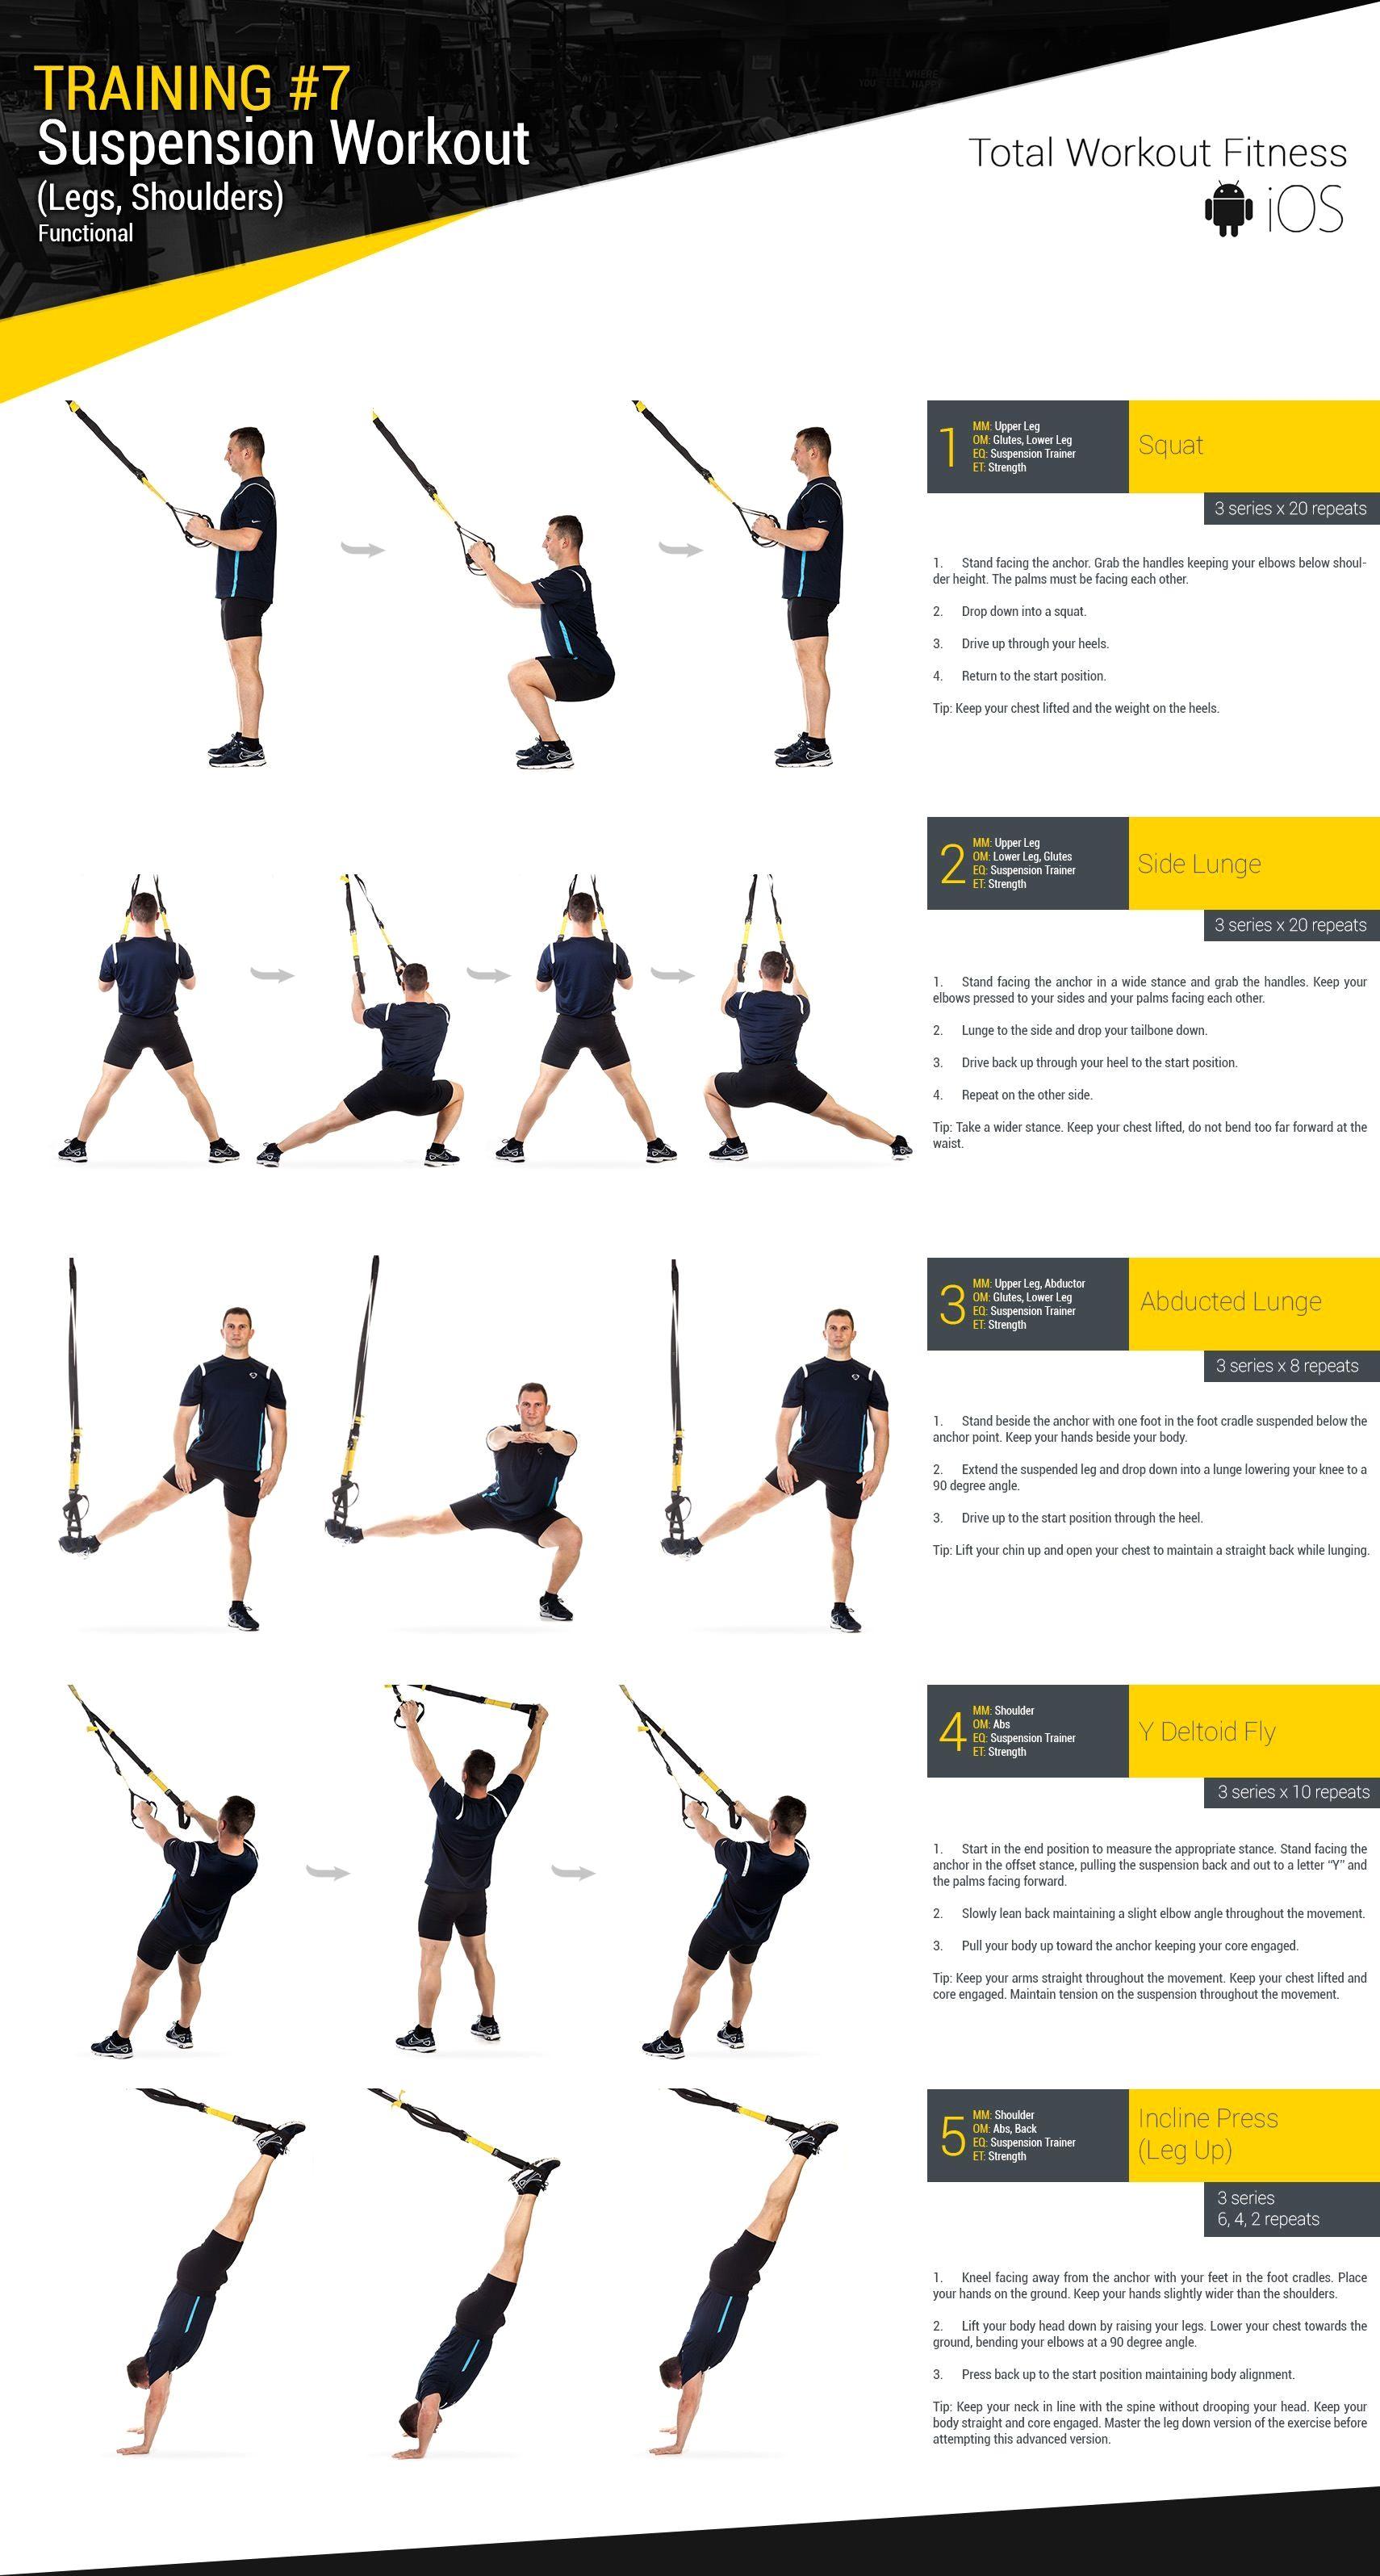 Online Physical Trainer Certification Trainingfitness Training